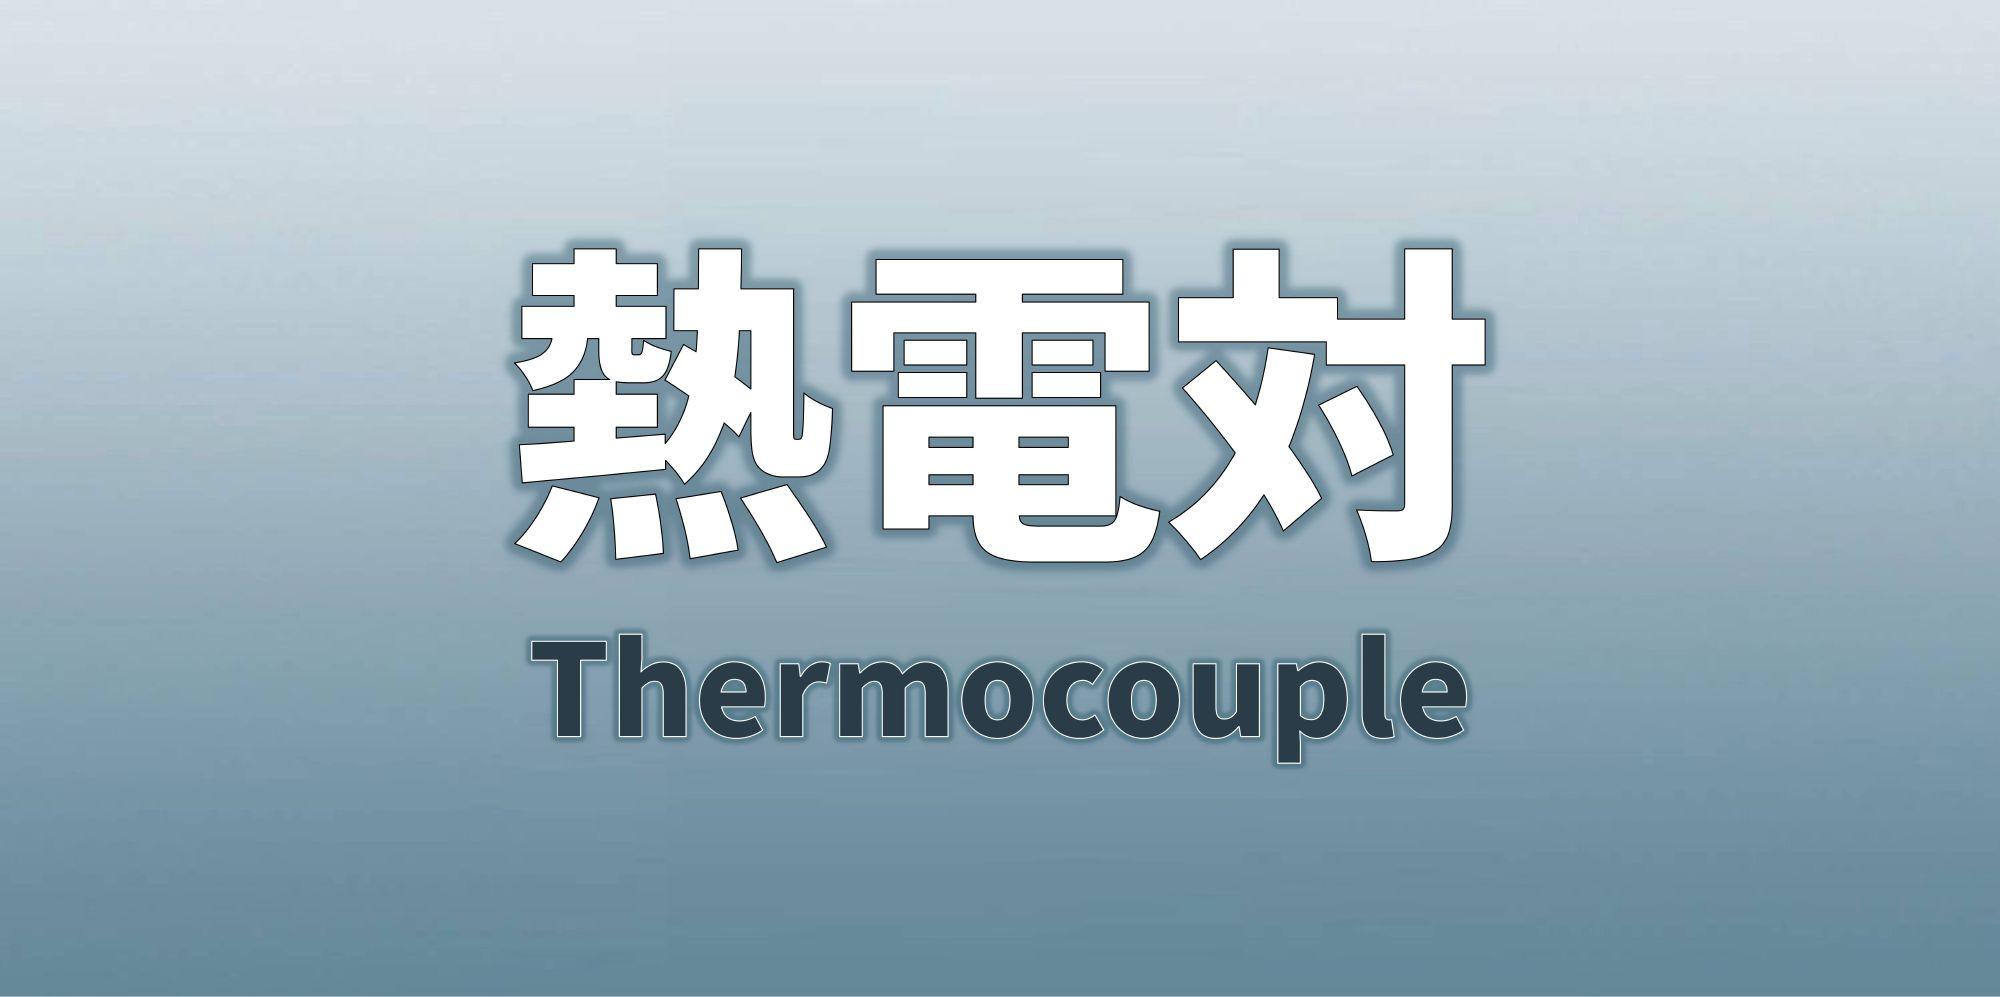 jp_thermocoulpe_thumbnail_2.jpg